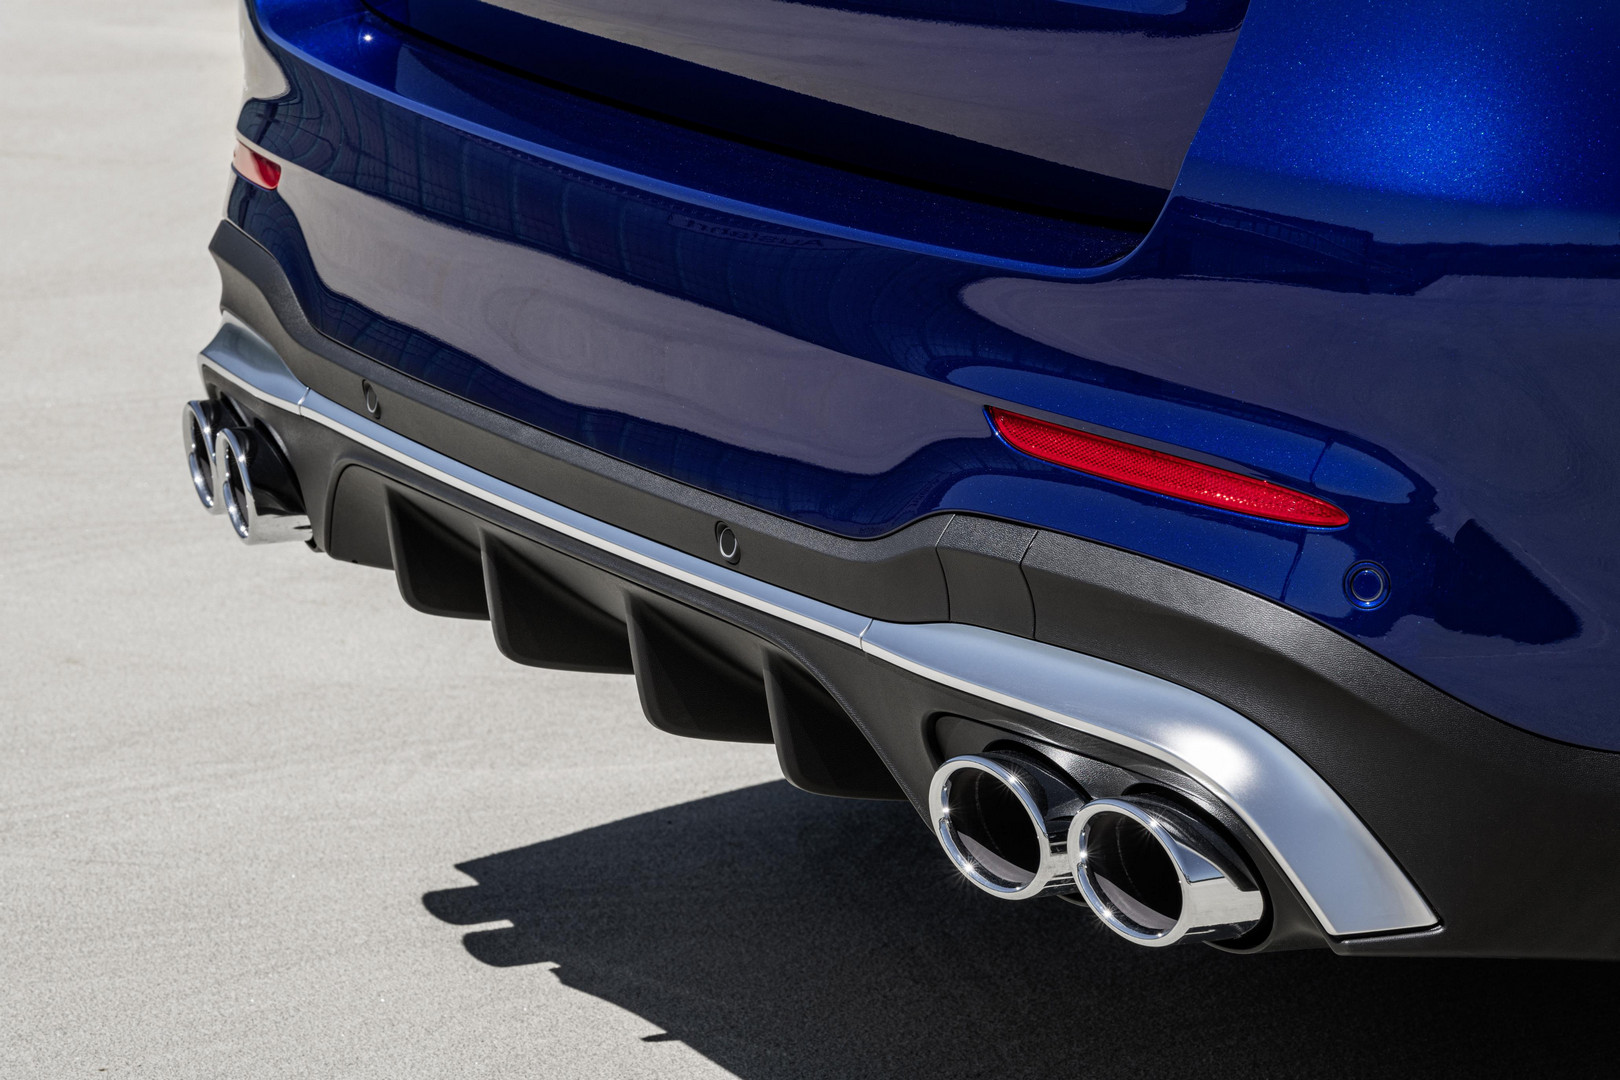 Mercedes-AMG GLC 43 SUV Exhaust Tips